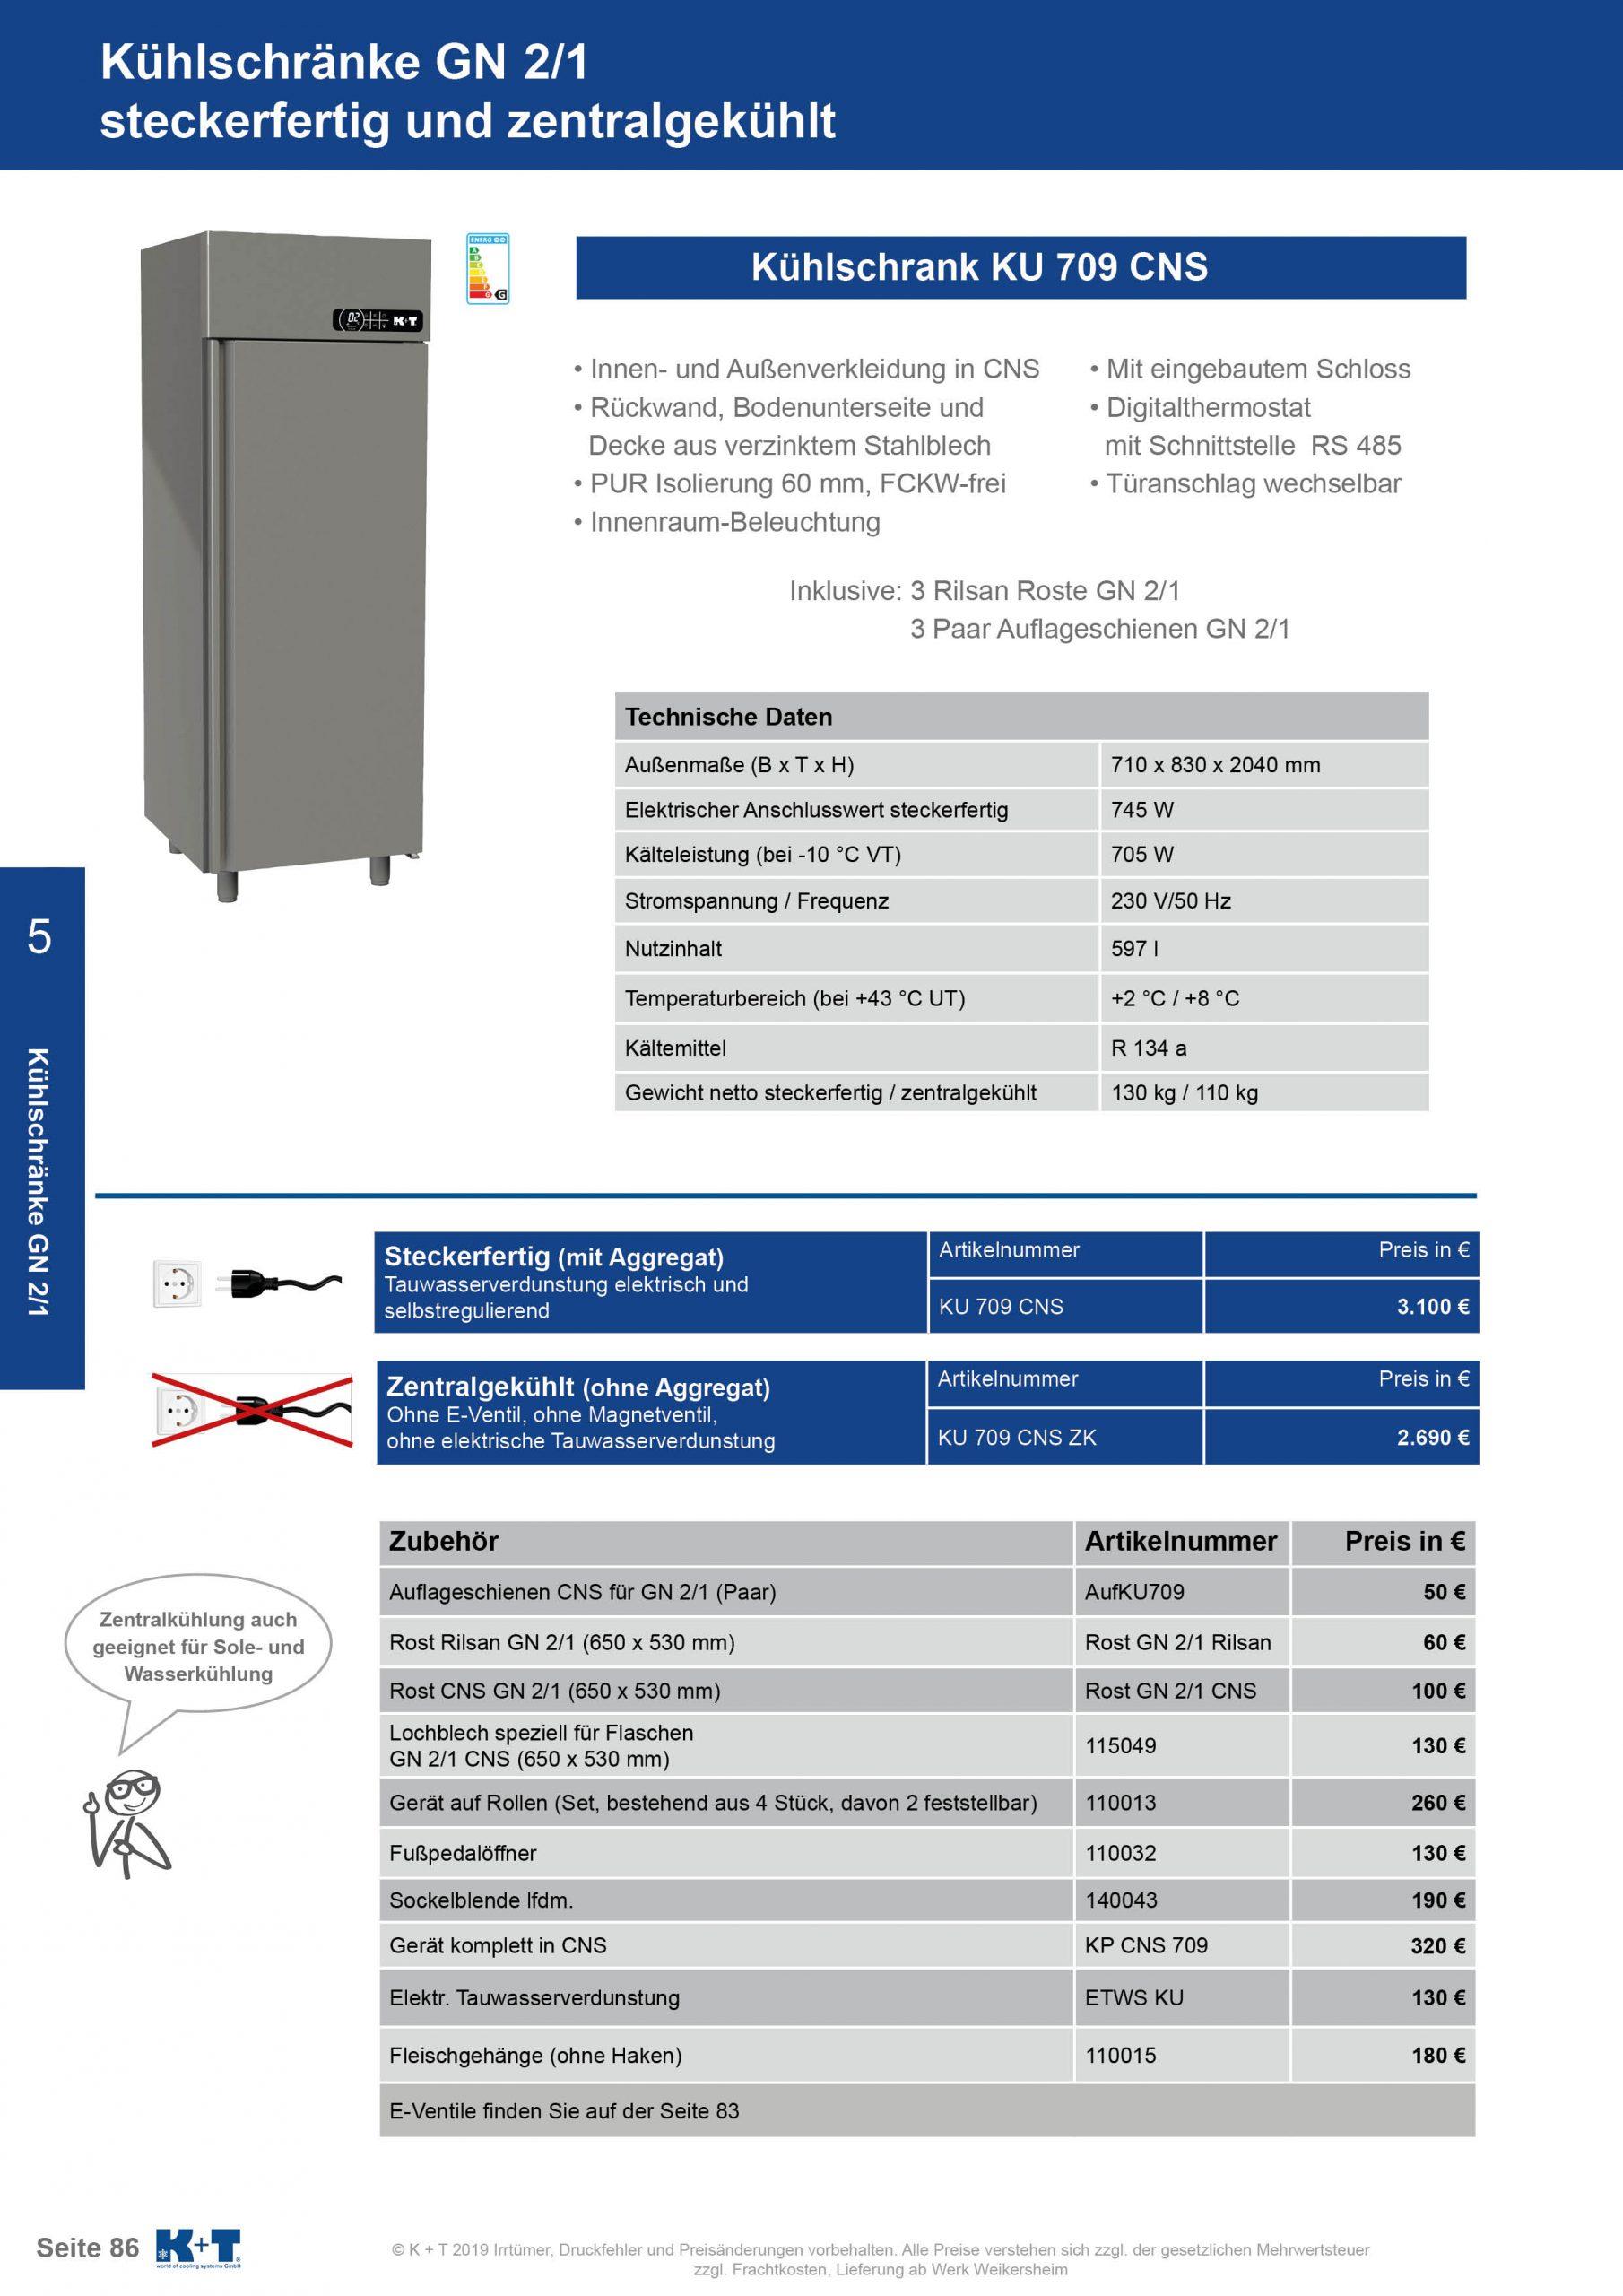 Kühlschränke GN 2_1 Kühlschrank zentralgekühlt